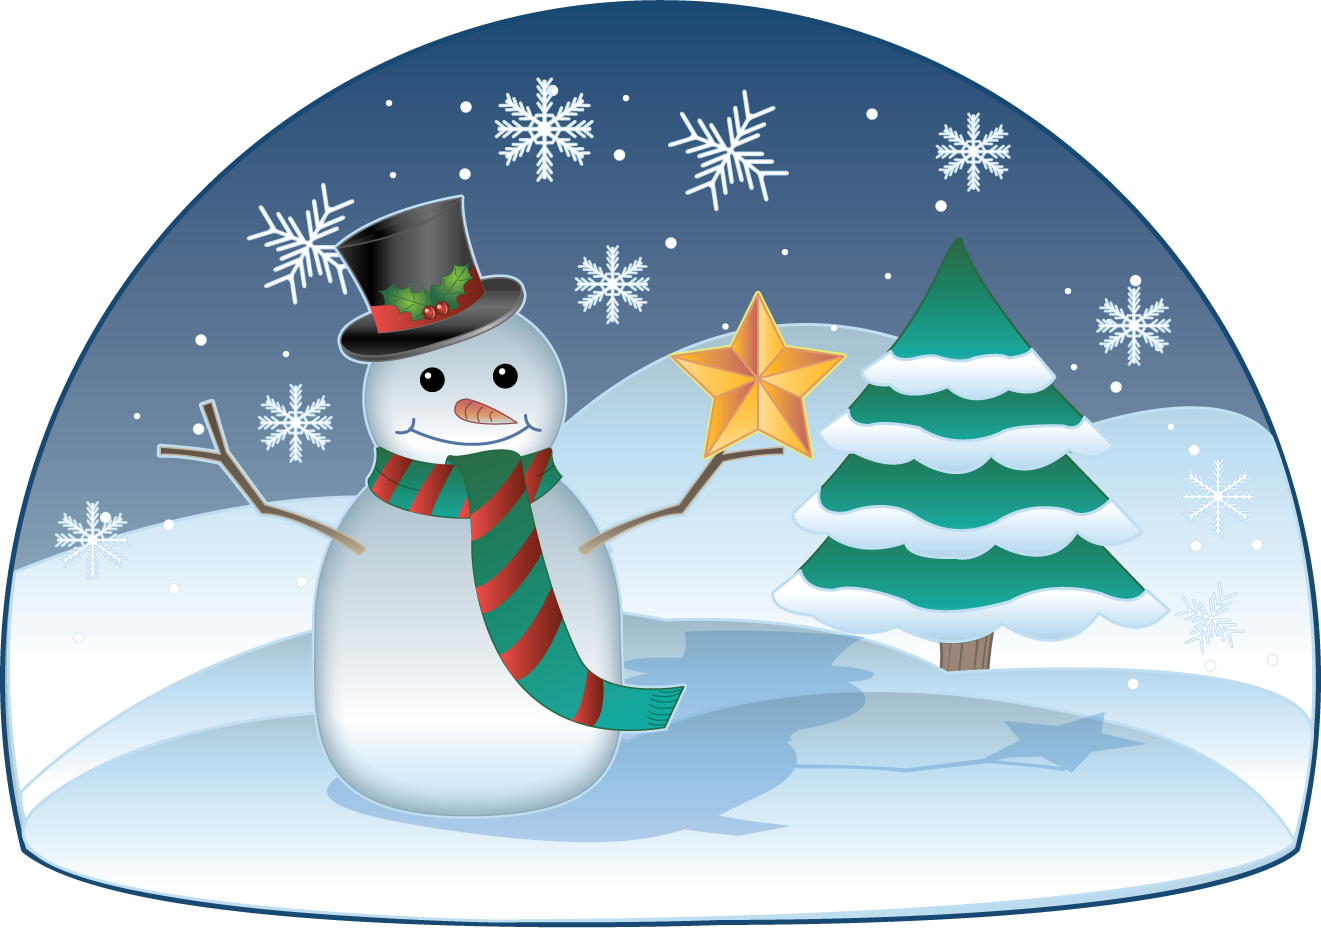 Free Clip Art Holiday Clip Art Christmas-Free Clip Art Holiday Clip Art Christmas Snowman In Winter-1